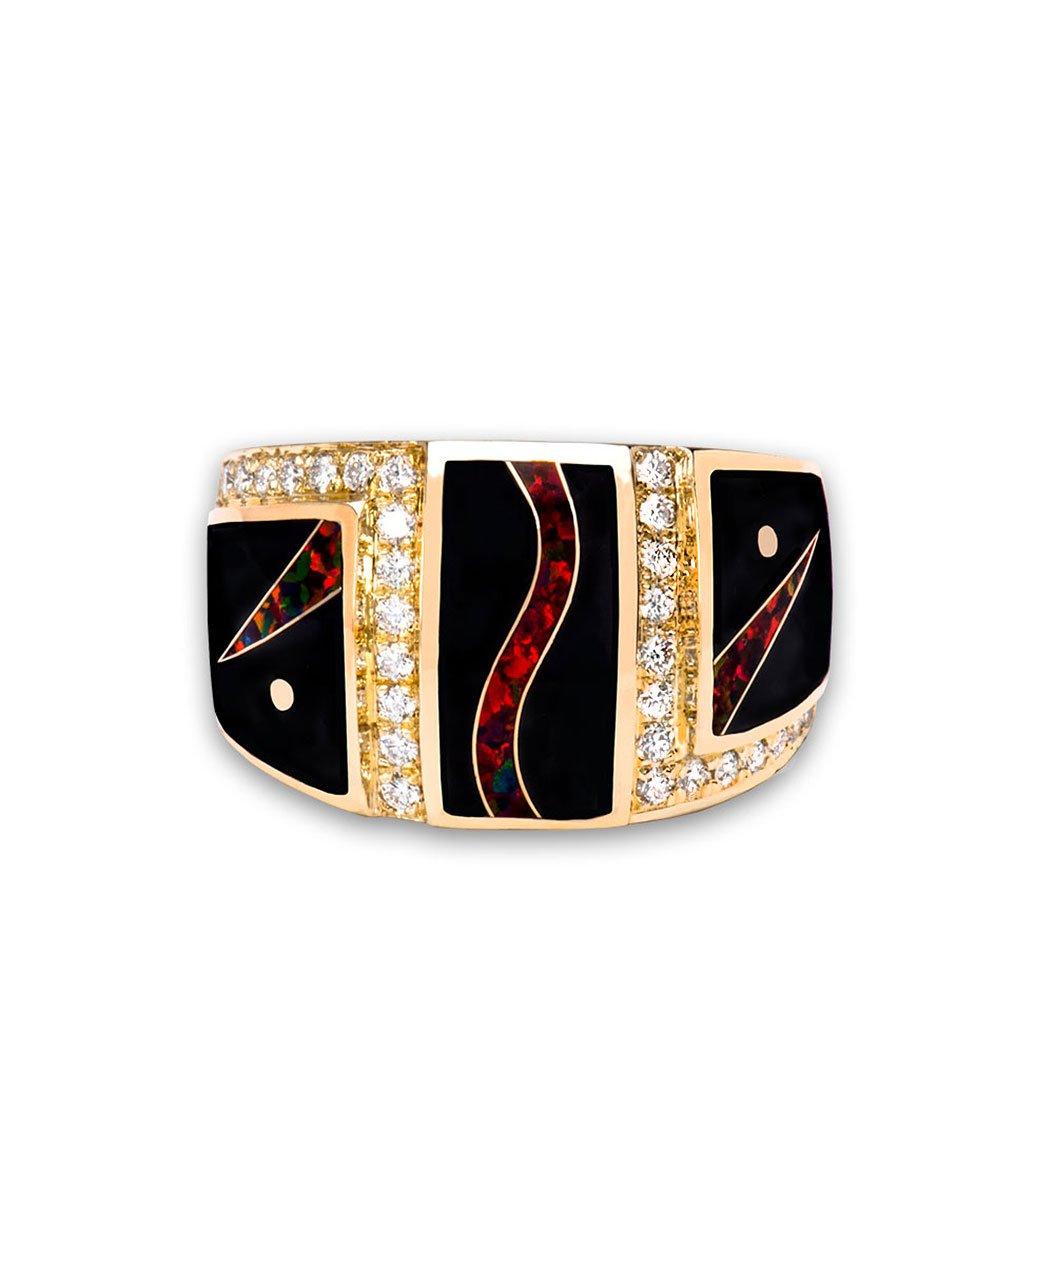 Maverick's 14K Gold Black Jade Opal Diamond Ring